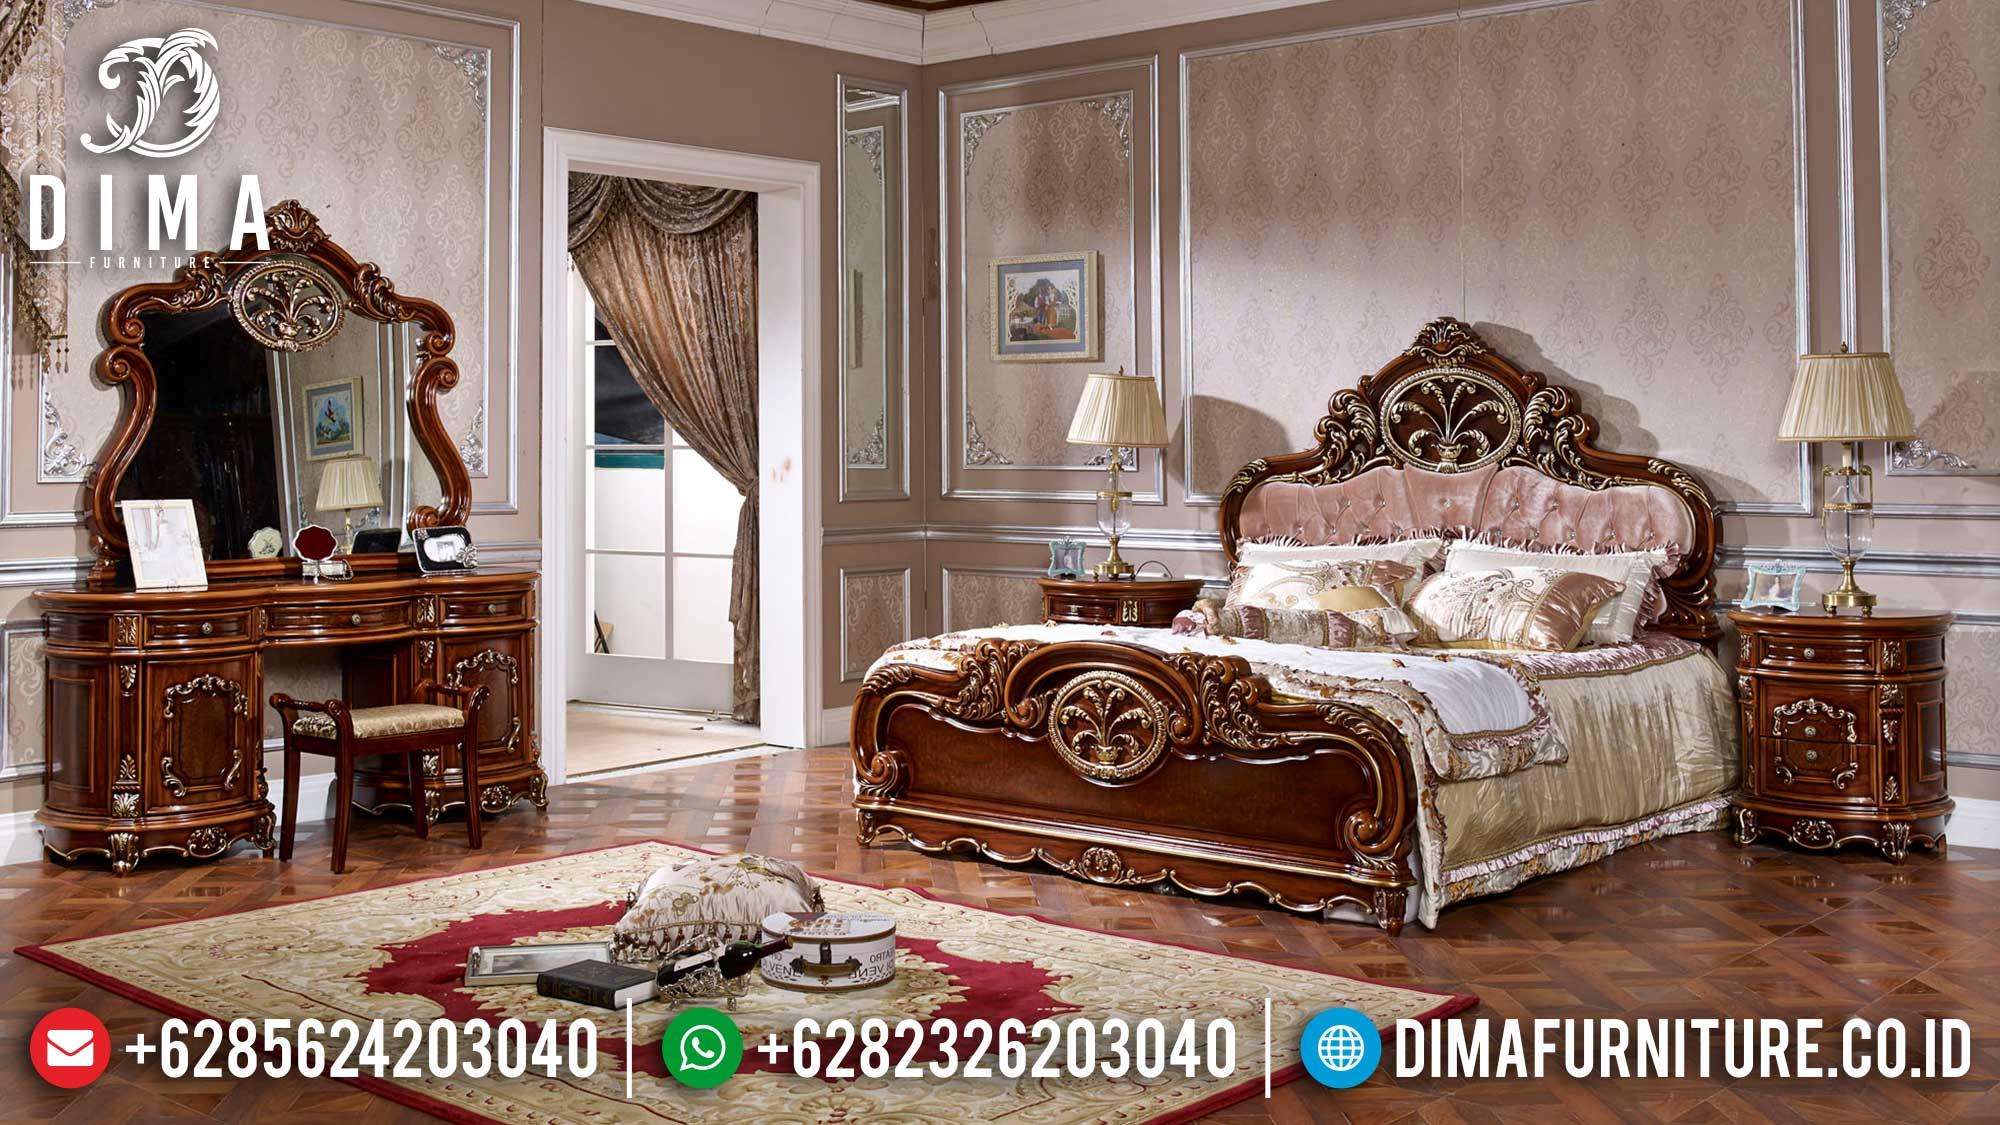 Best Model Kamar Set Mewah Terbaru Luxury Classic Natural Jati ST-1154